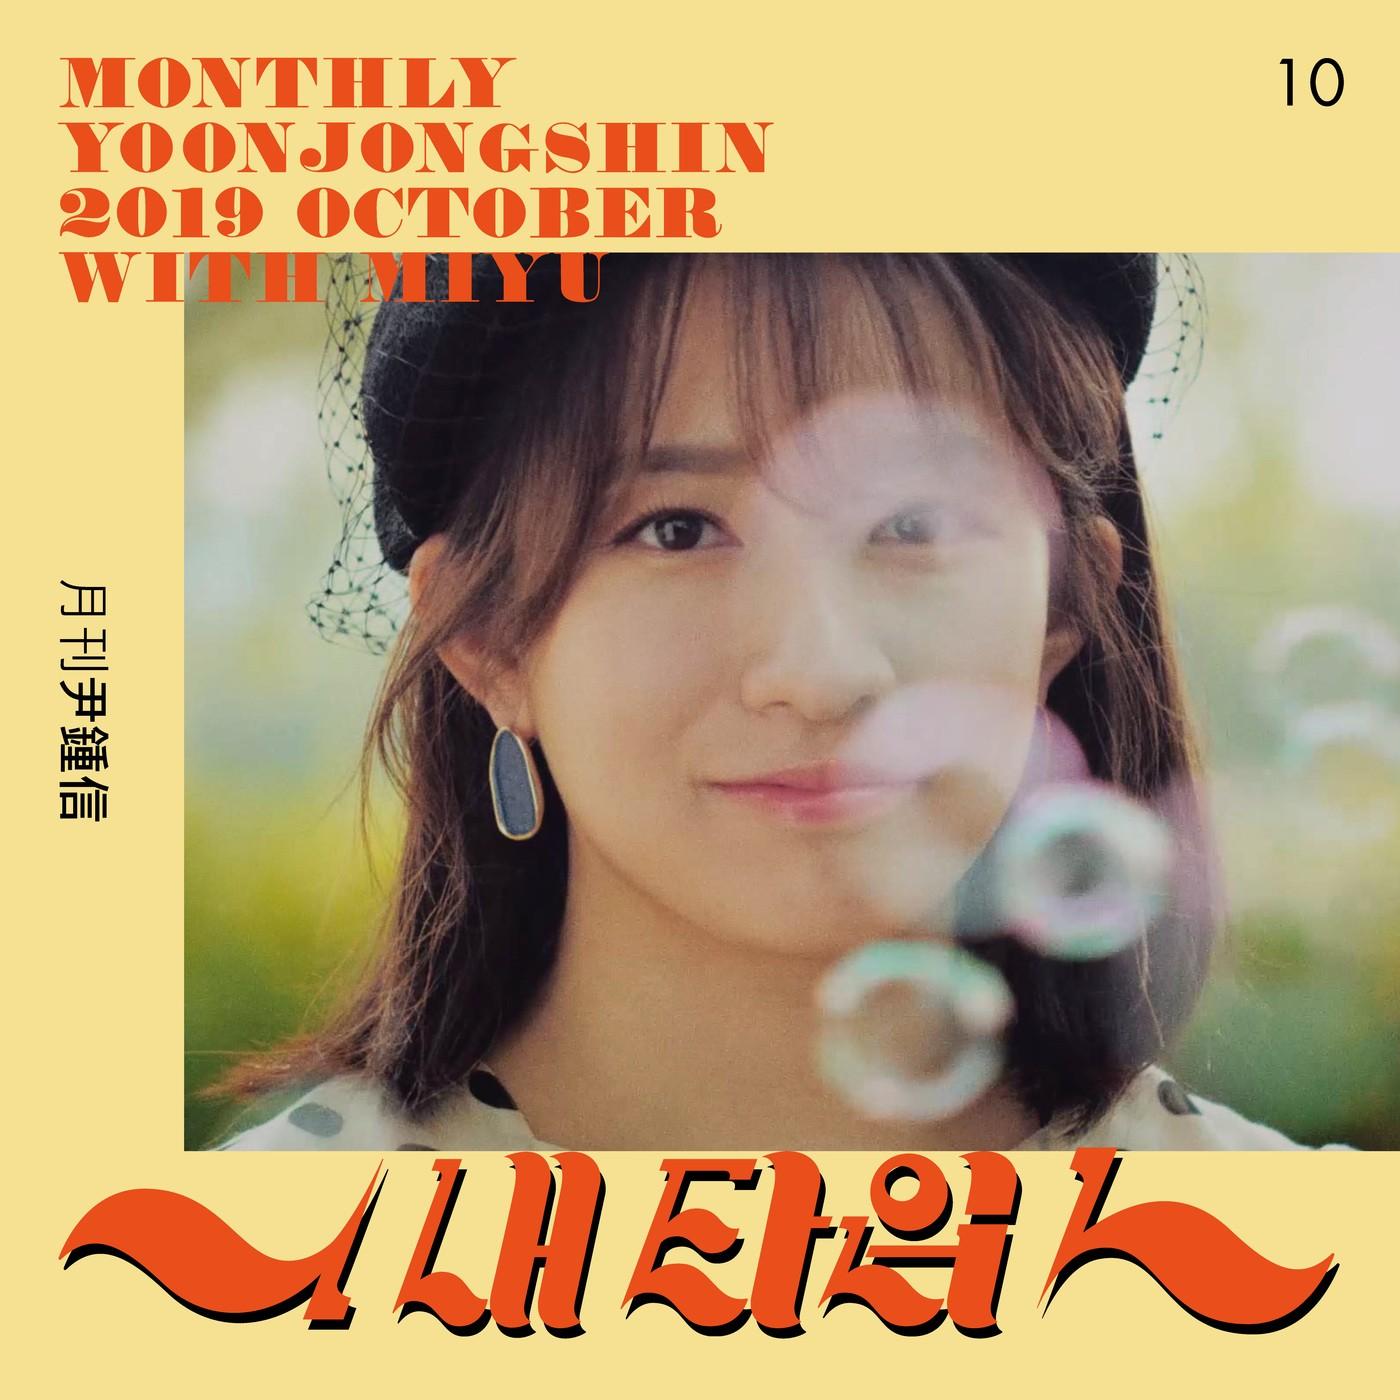 MIYU – Monthly Project 2019 October Yoon Jong Shin [FLAC + MP3 320 / WEB] [2019.10.23]